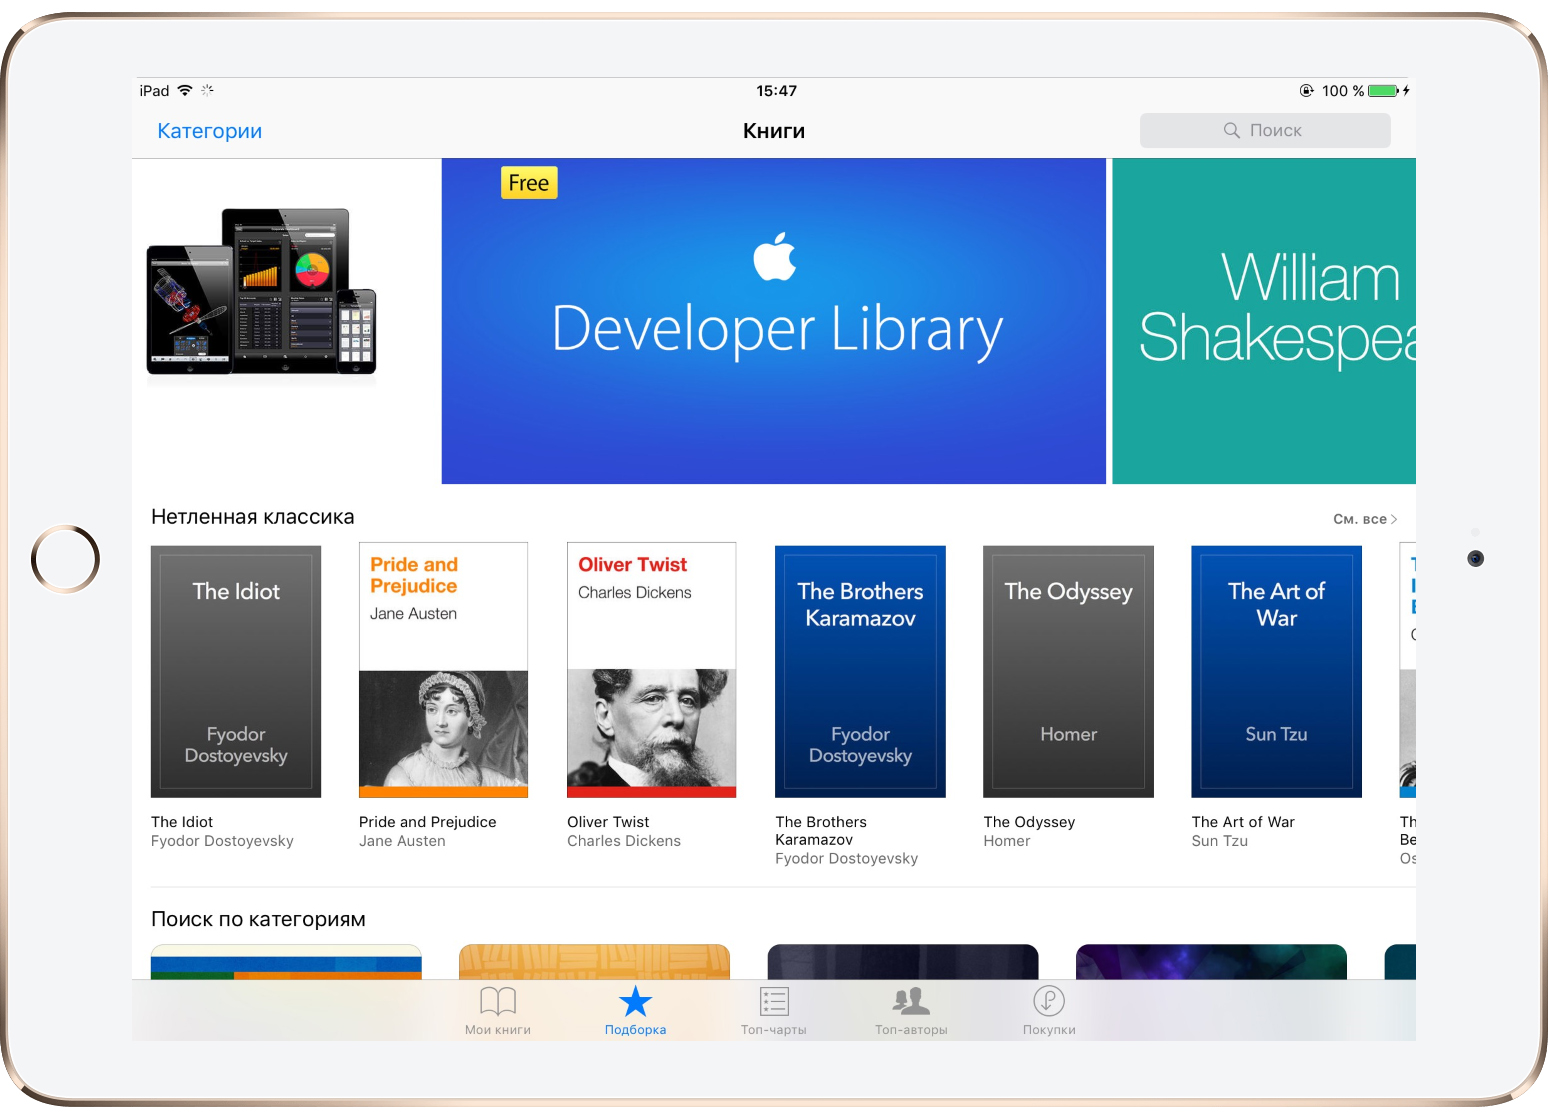 Как читать книги на iPhone через iBooks